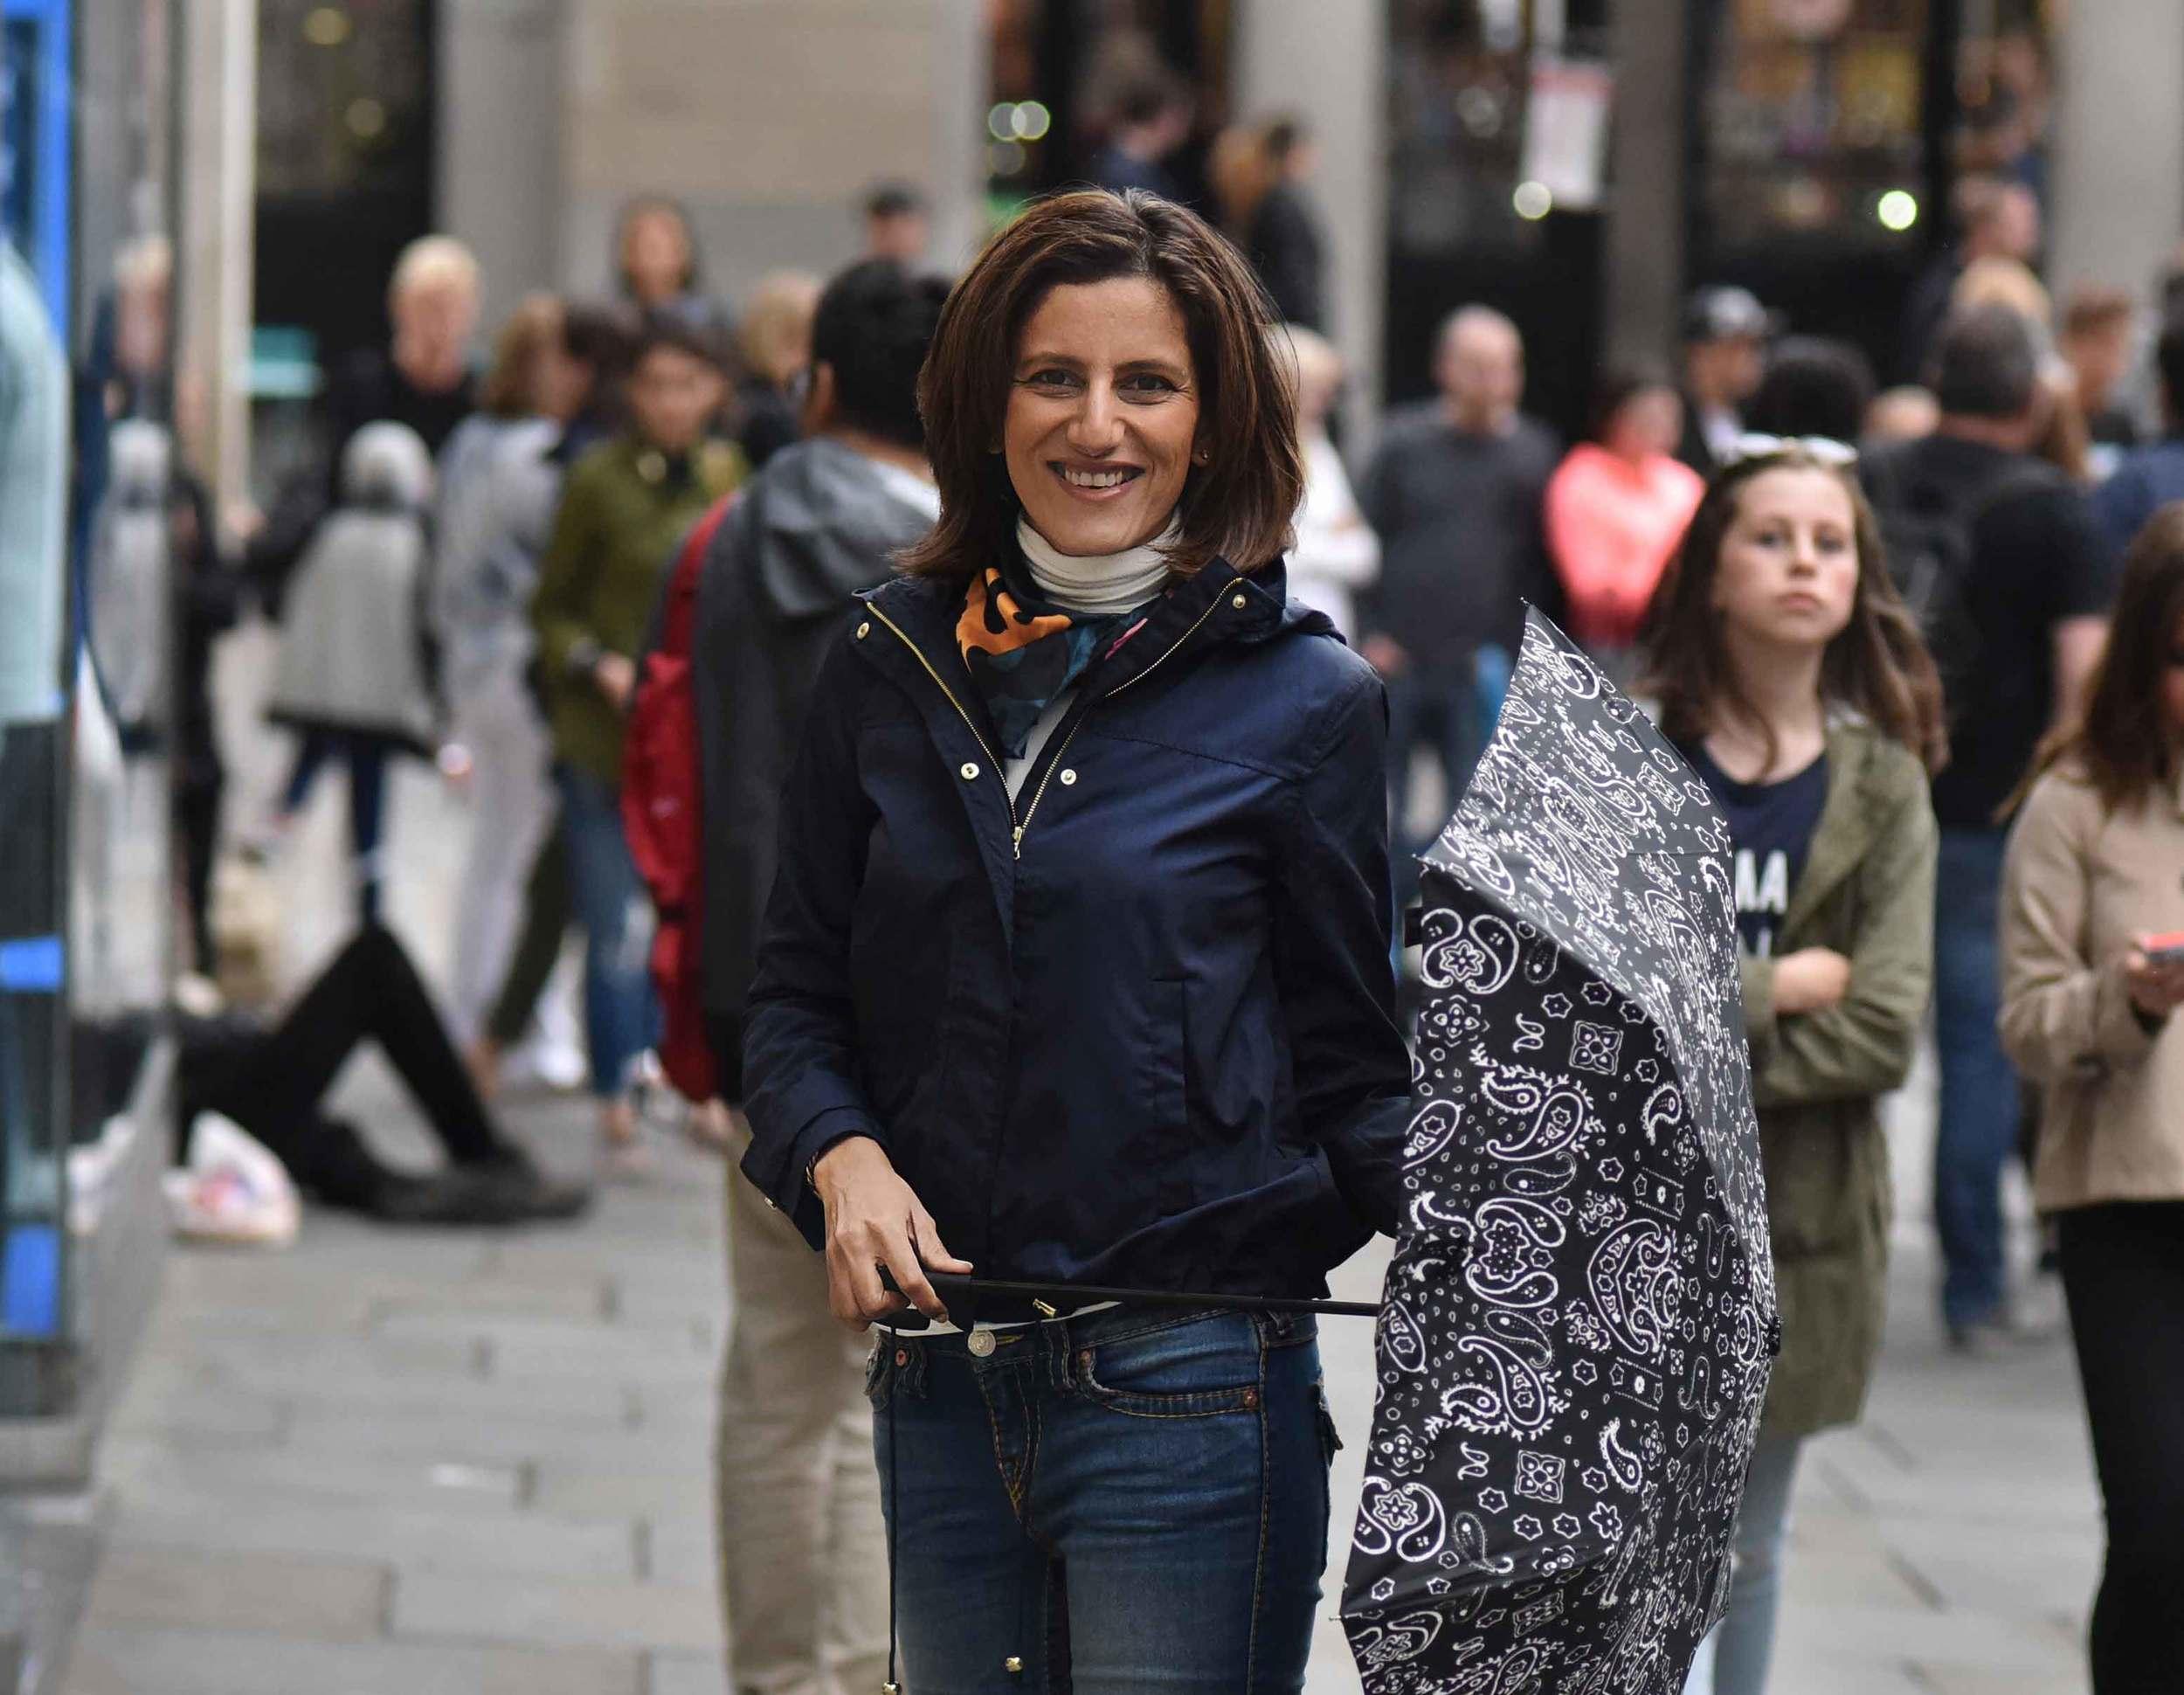 Zara water repellent jacket, Zara printed pocket square, Zara bandana print umbrella, True Religion jeans, Ralph Lauren polo sweater, Covent Garden, London, UK. Image©sourcingstyle.com